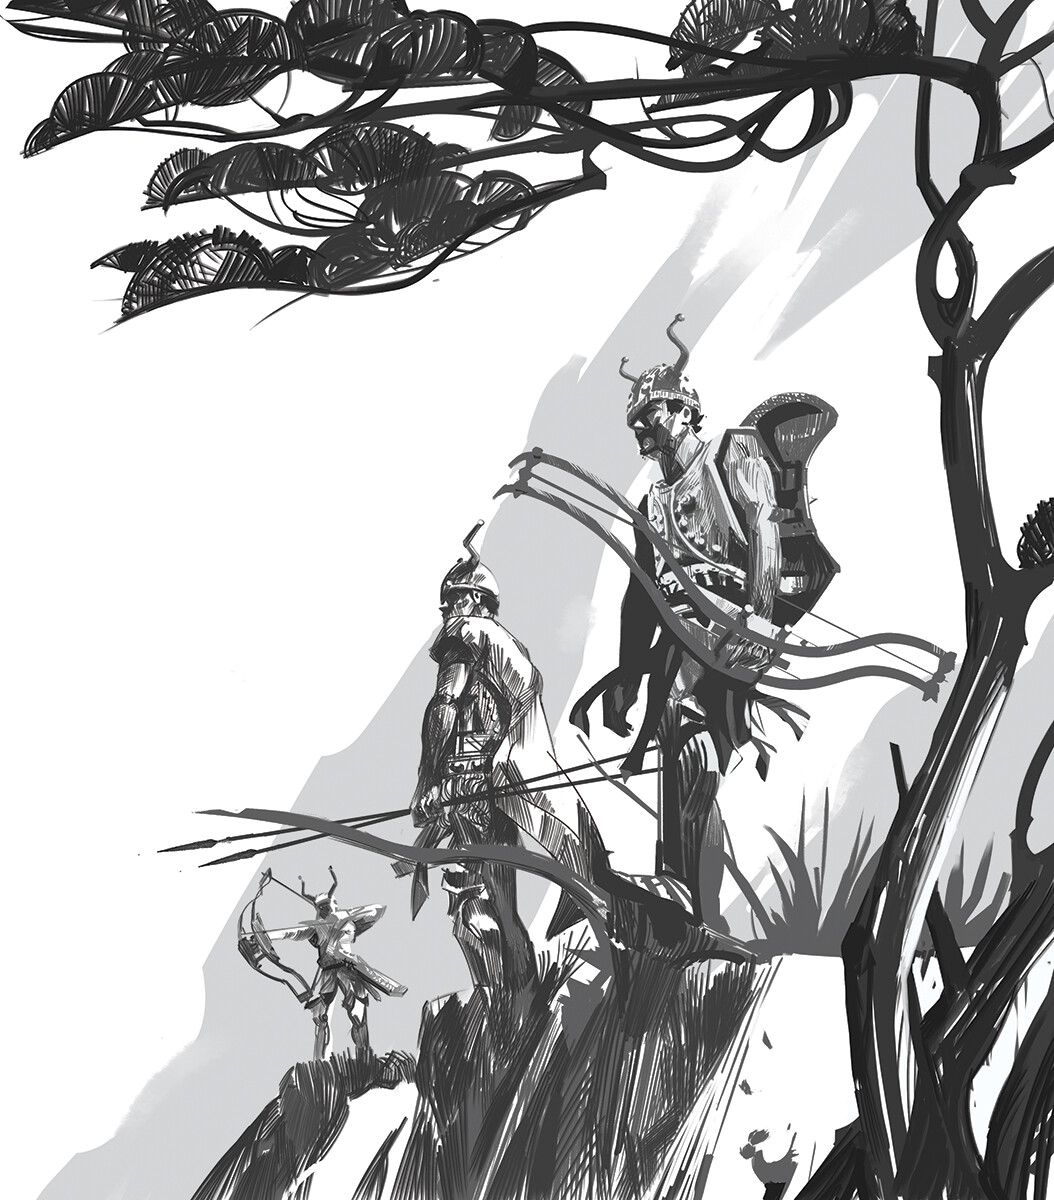 Agrauran Archers